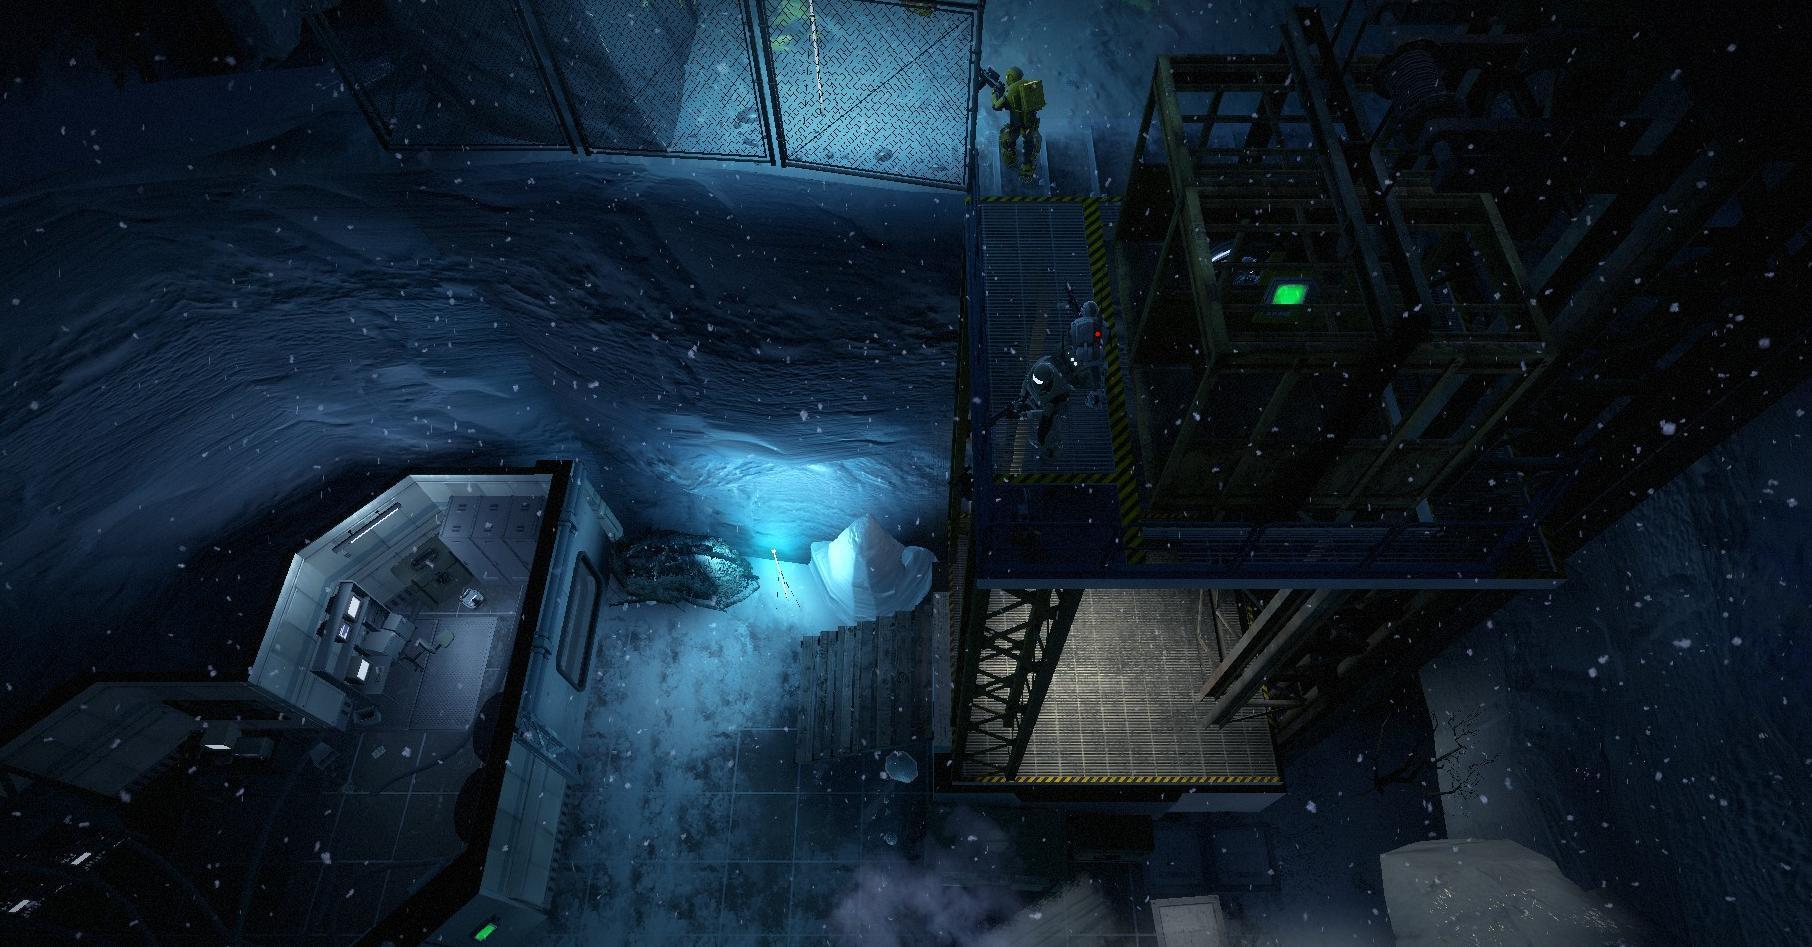 Alien Swarm Reactive Drop Gameplay Tips And Tricks